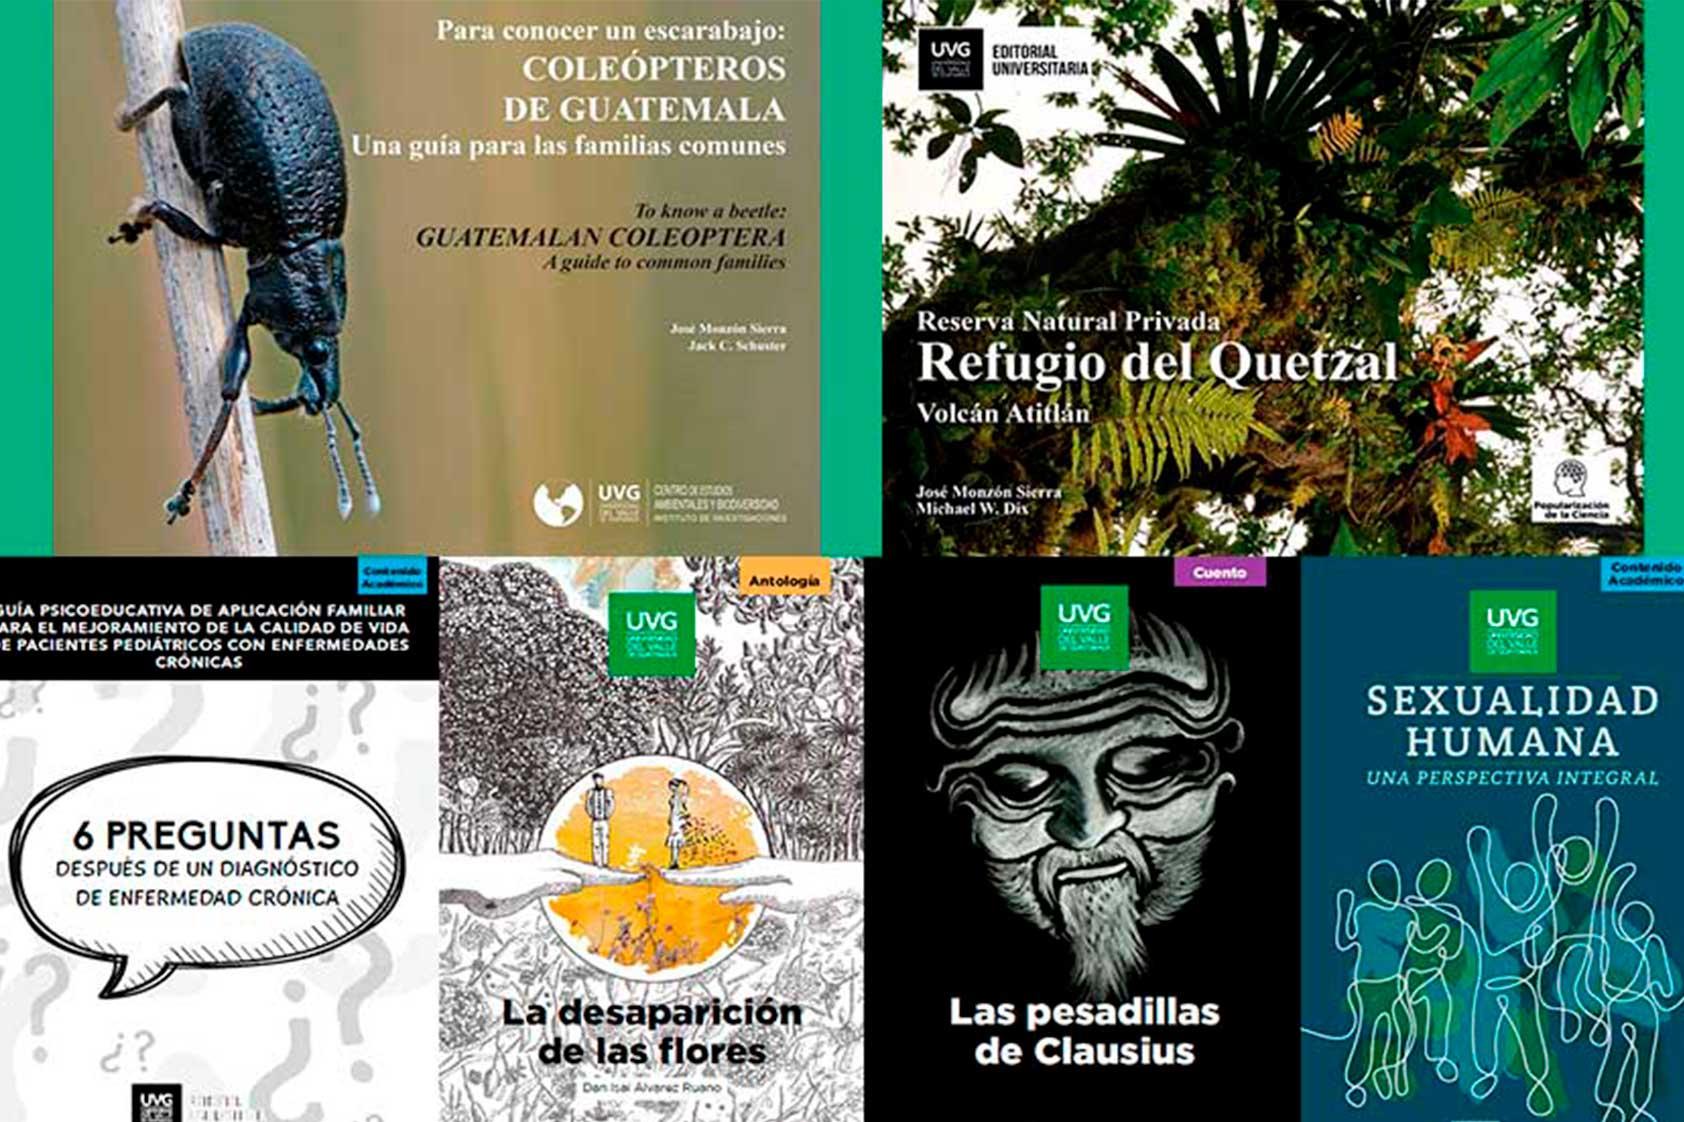 Editorial UVG arranca con importante aporte a la literatura e investigación